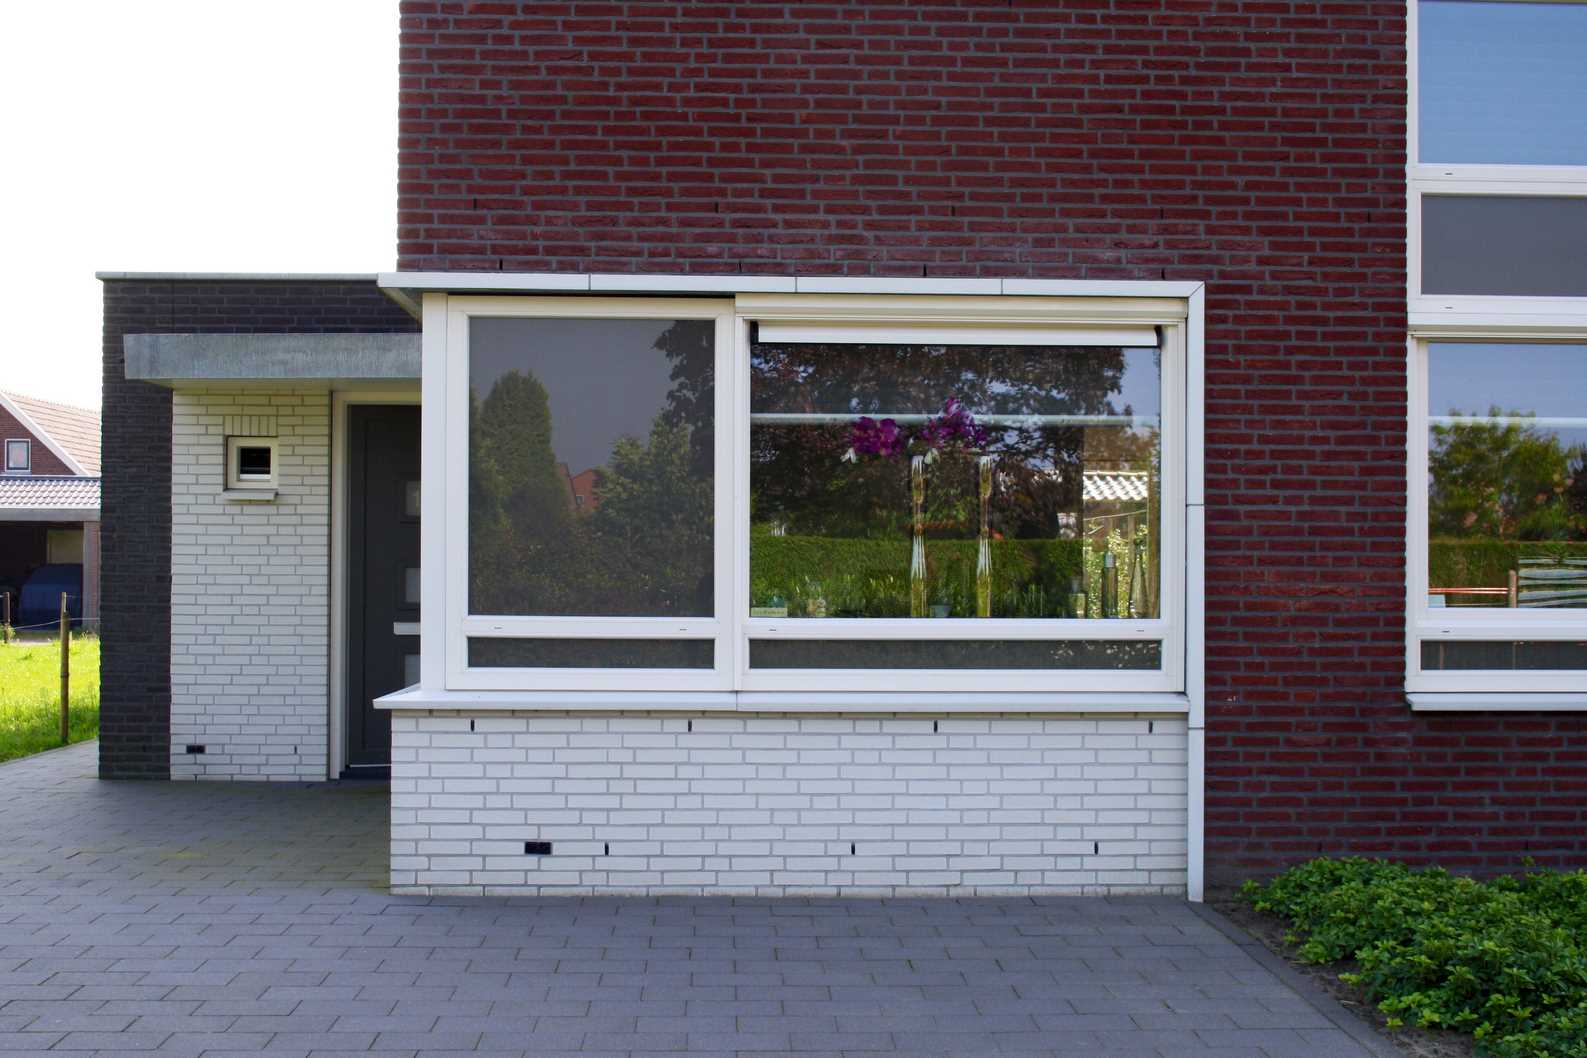 www.renescholtenarchitectuur.nl-project 07-f03 (Kopie)